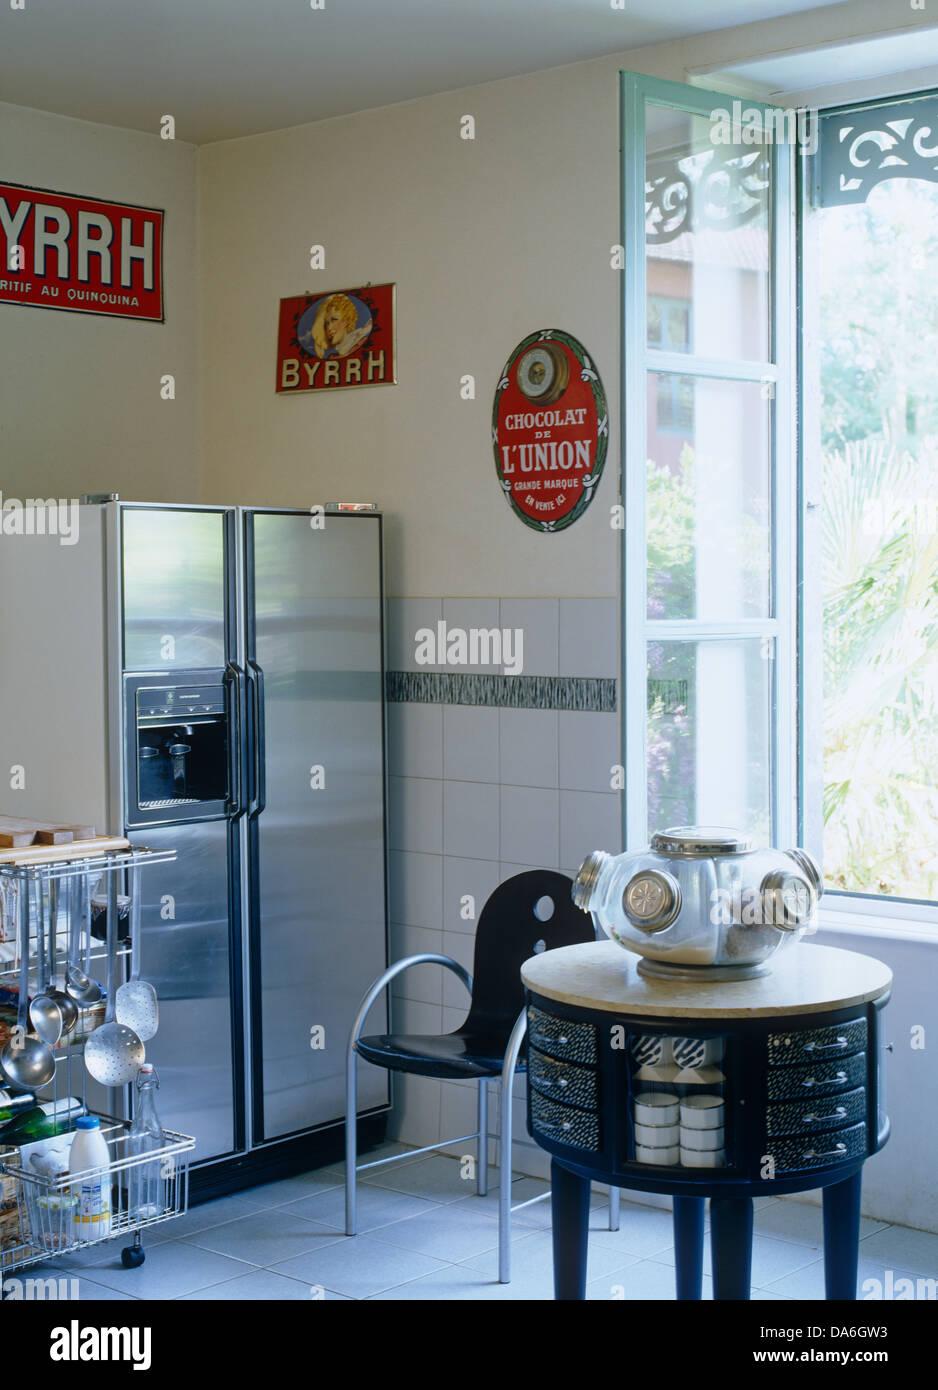 Acero inoxidable despensa nevera en la esquina de la cocina francesa ...